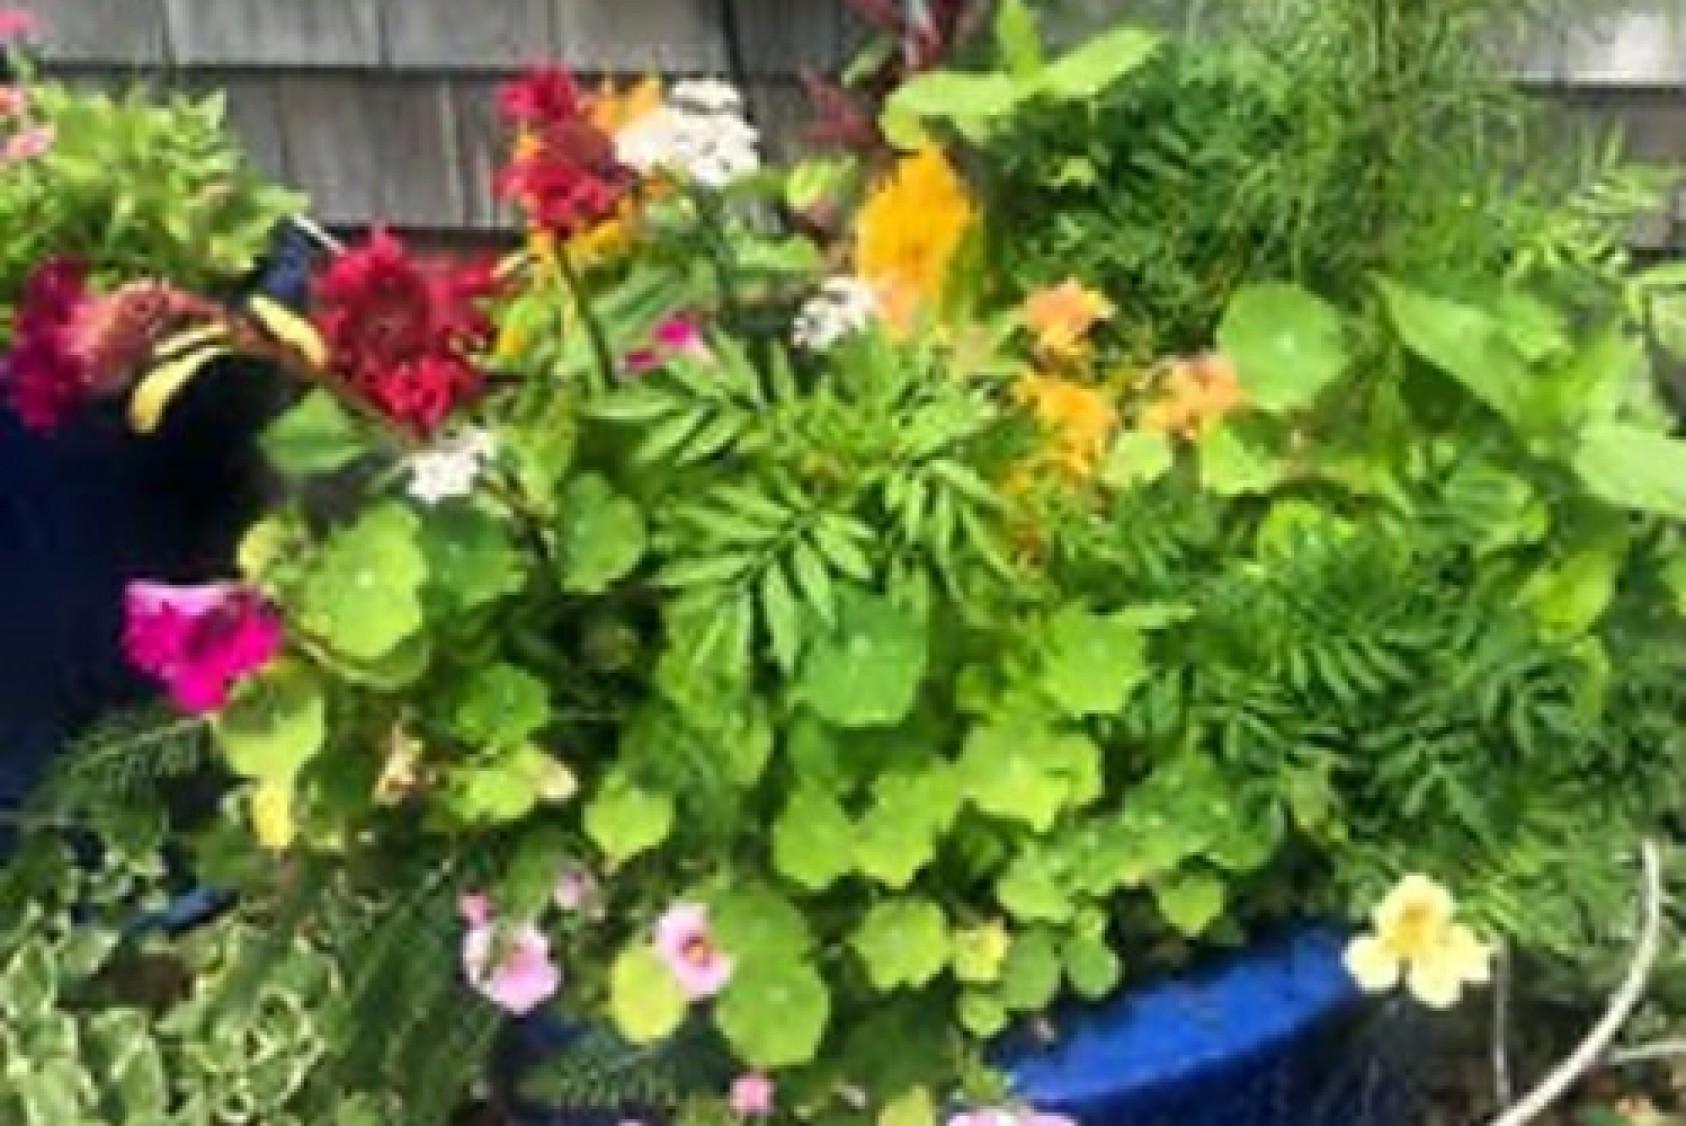 Container garden with celosia, petunias, nasturtium, and cosmos